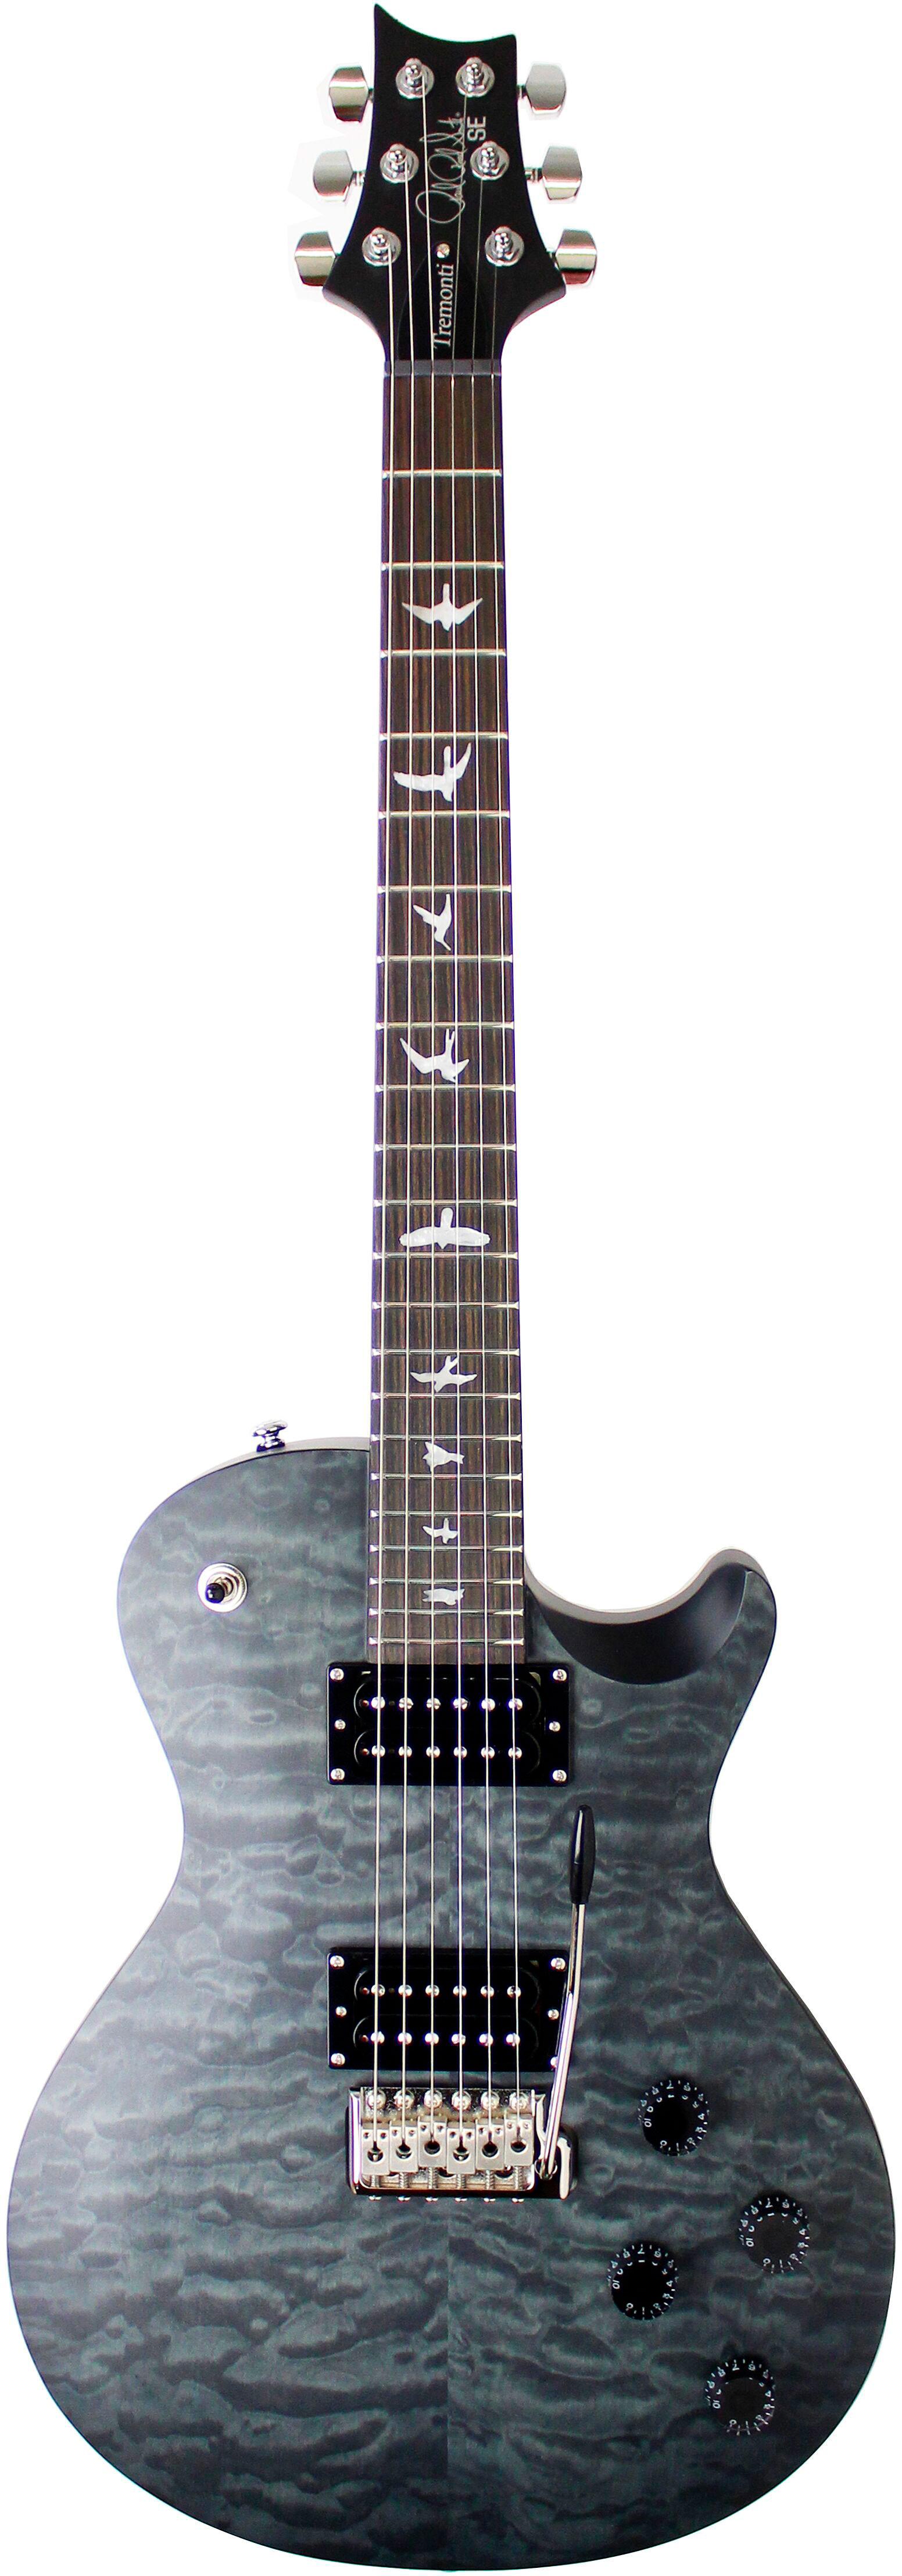 Prs guitars SE MARK TREMONTI SATIN QUILT STEALTH GREY BLACK